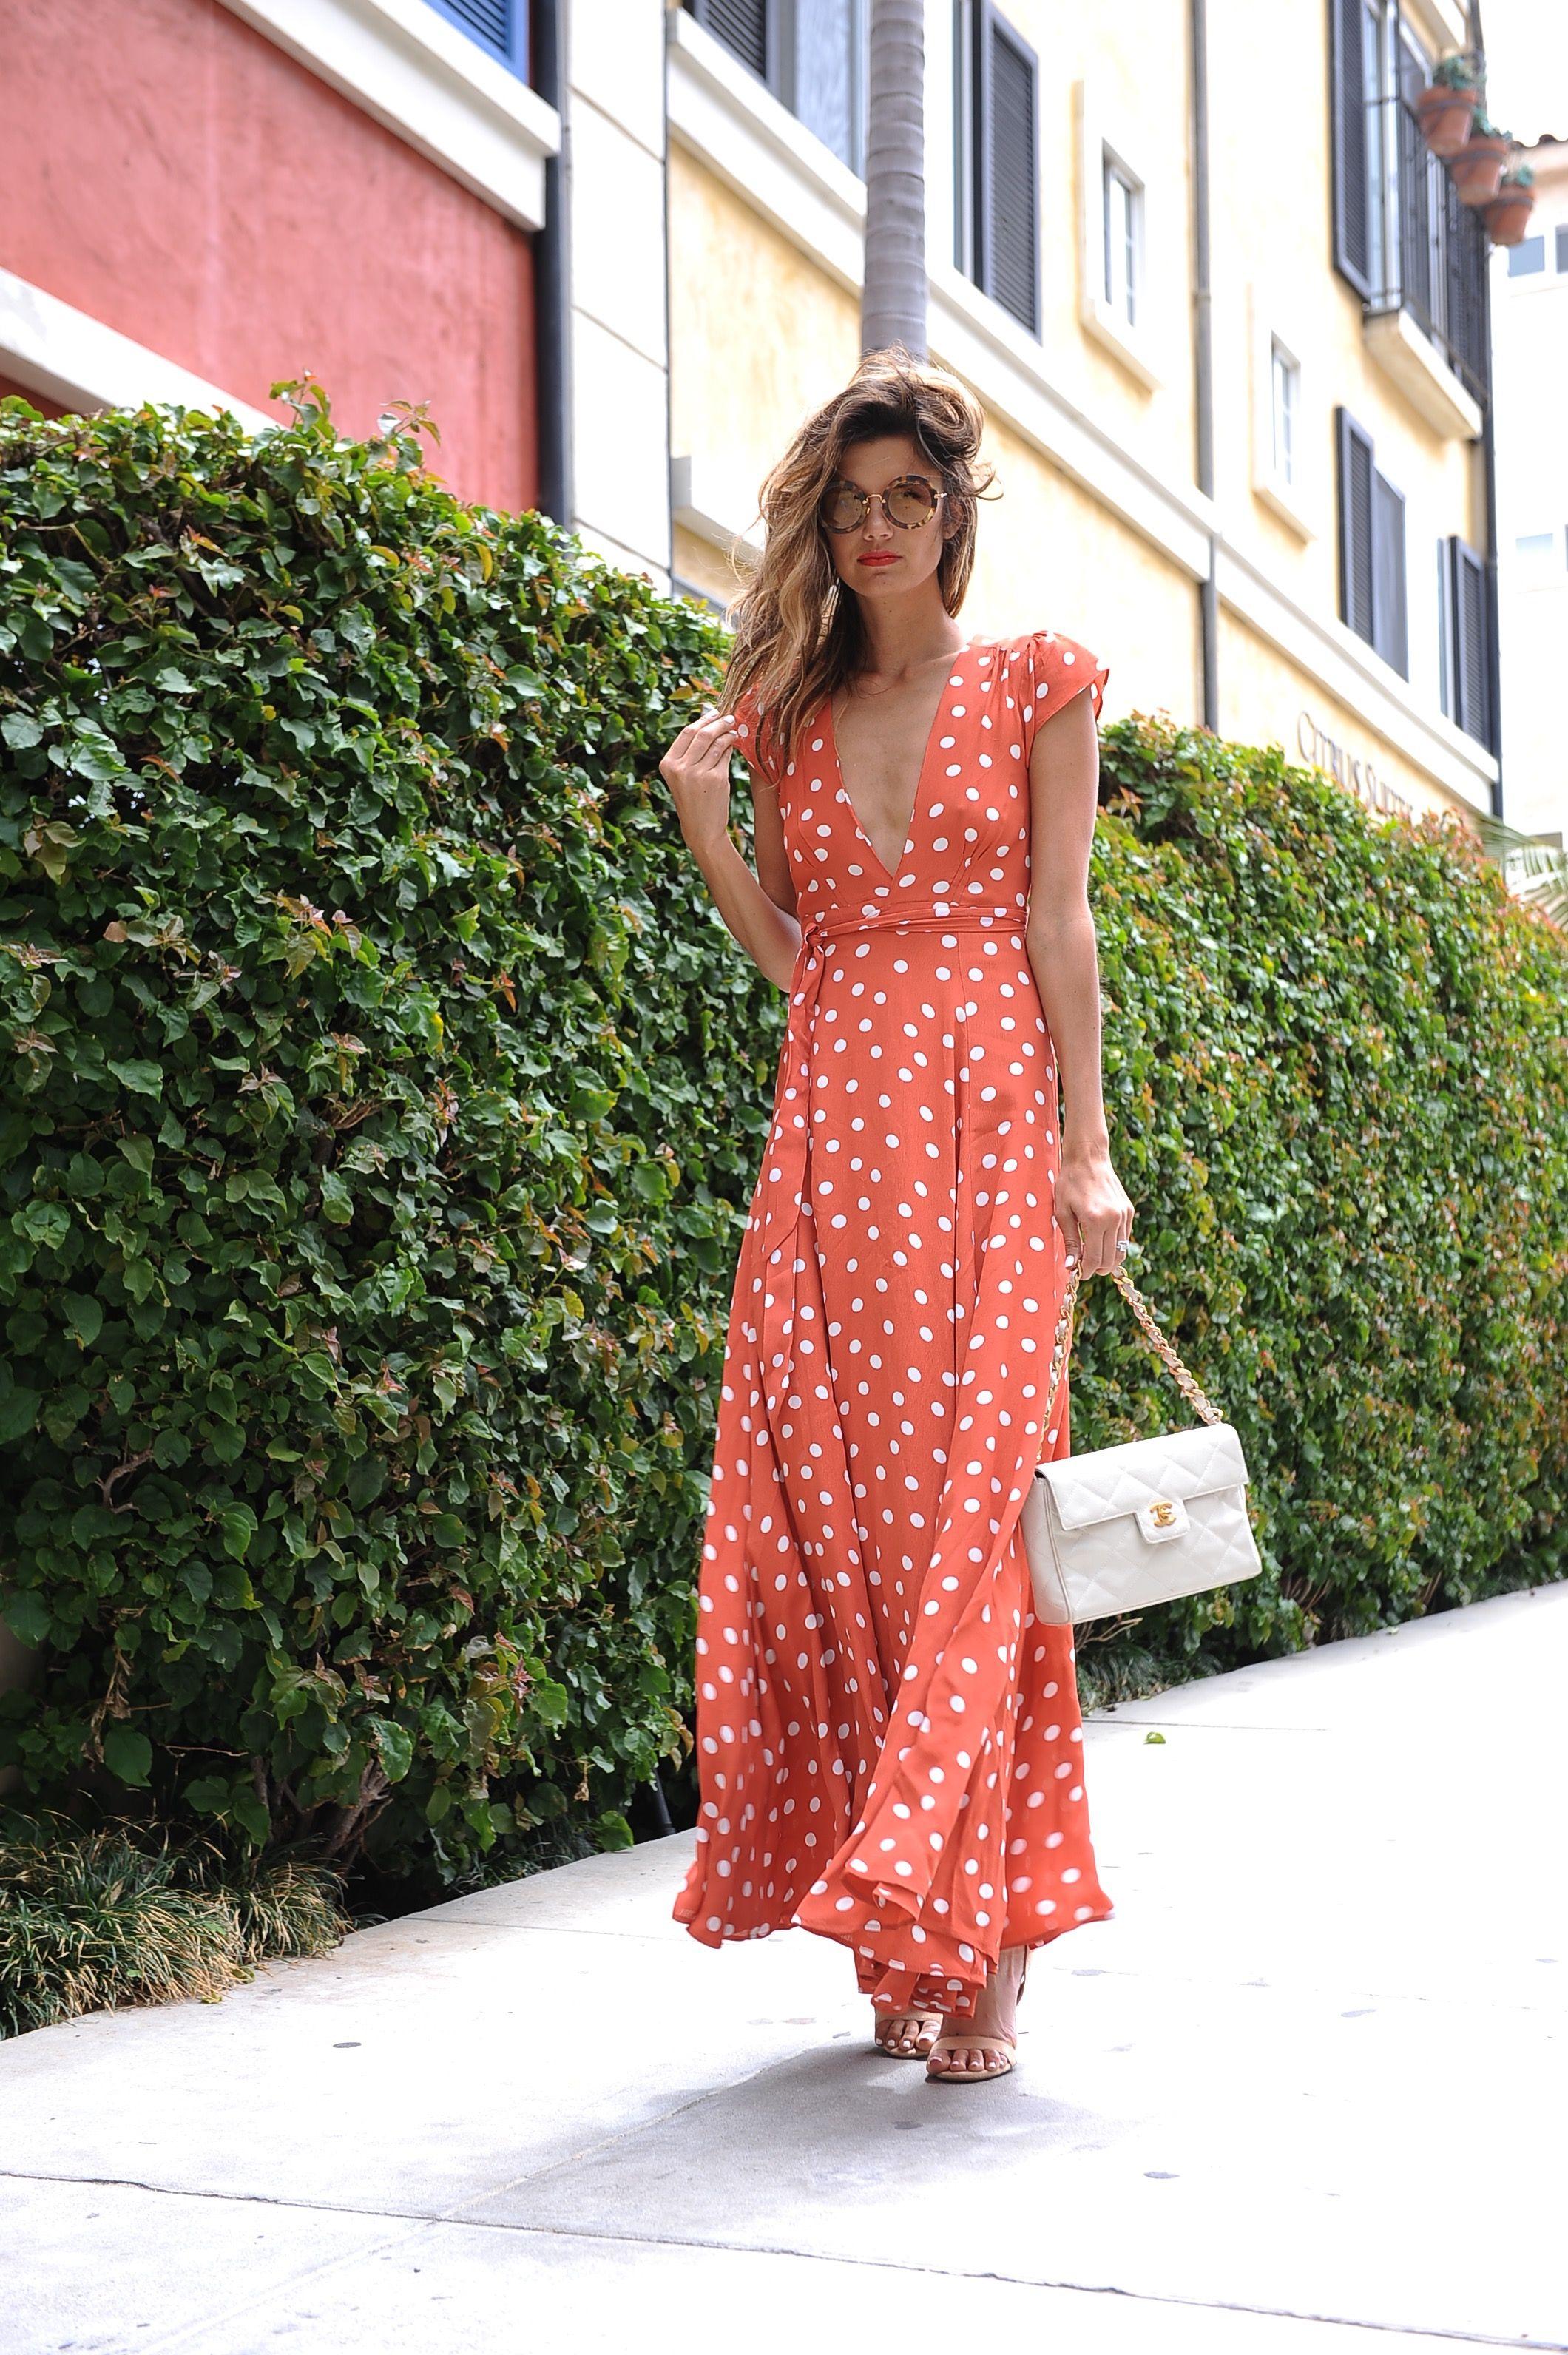 b6f1b3d1425d Tularosa Red Sid Wrap Maxi Dress #summer #wedding #style … | Abode ...